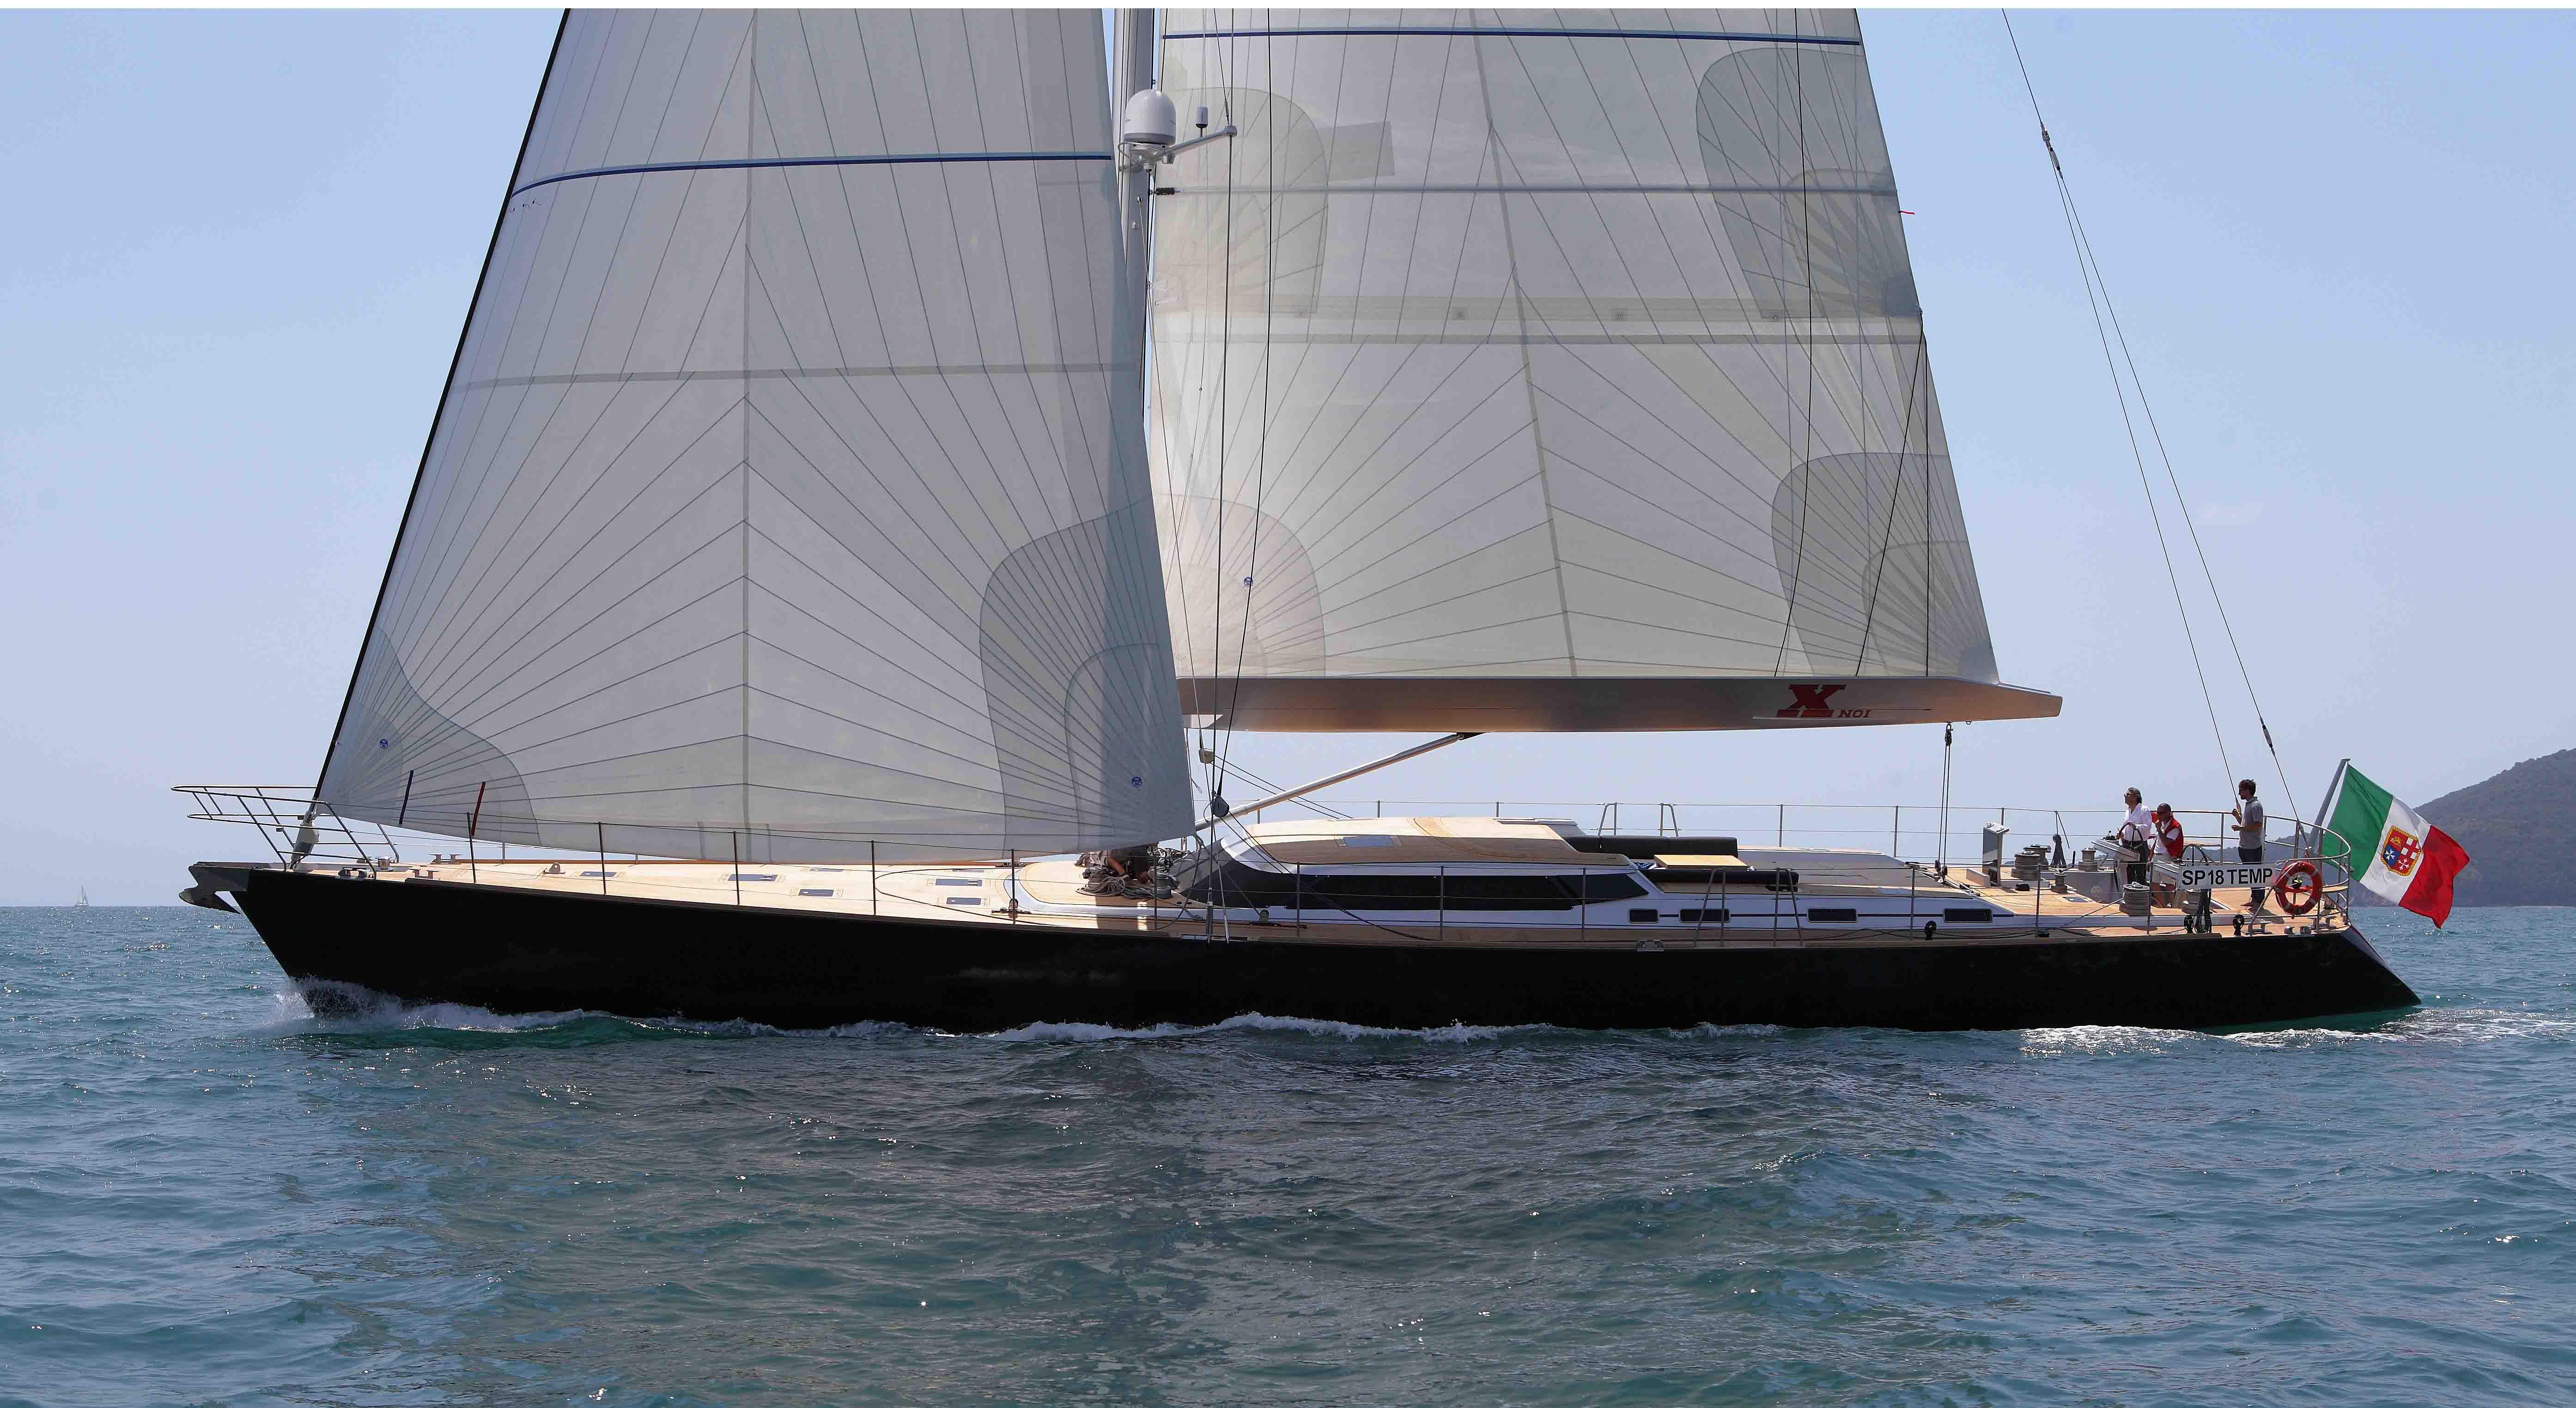 xnoi yacht charter details perini navi superyacht. Black Bedroom Furniture Sets. Home Design Ideas